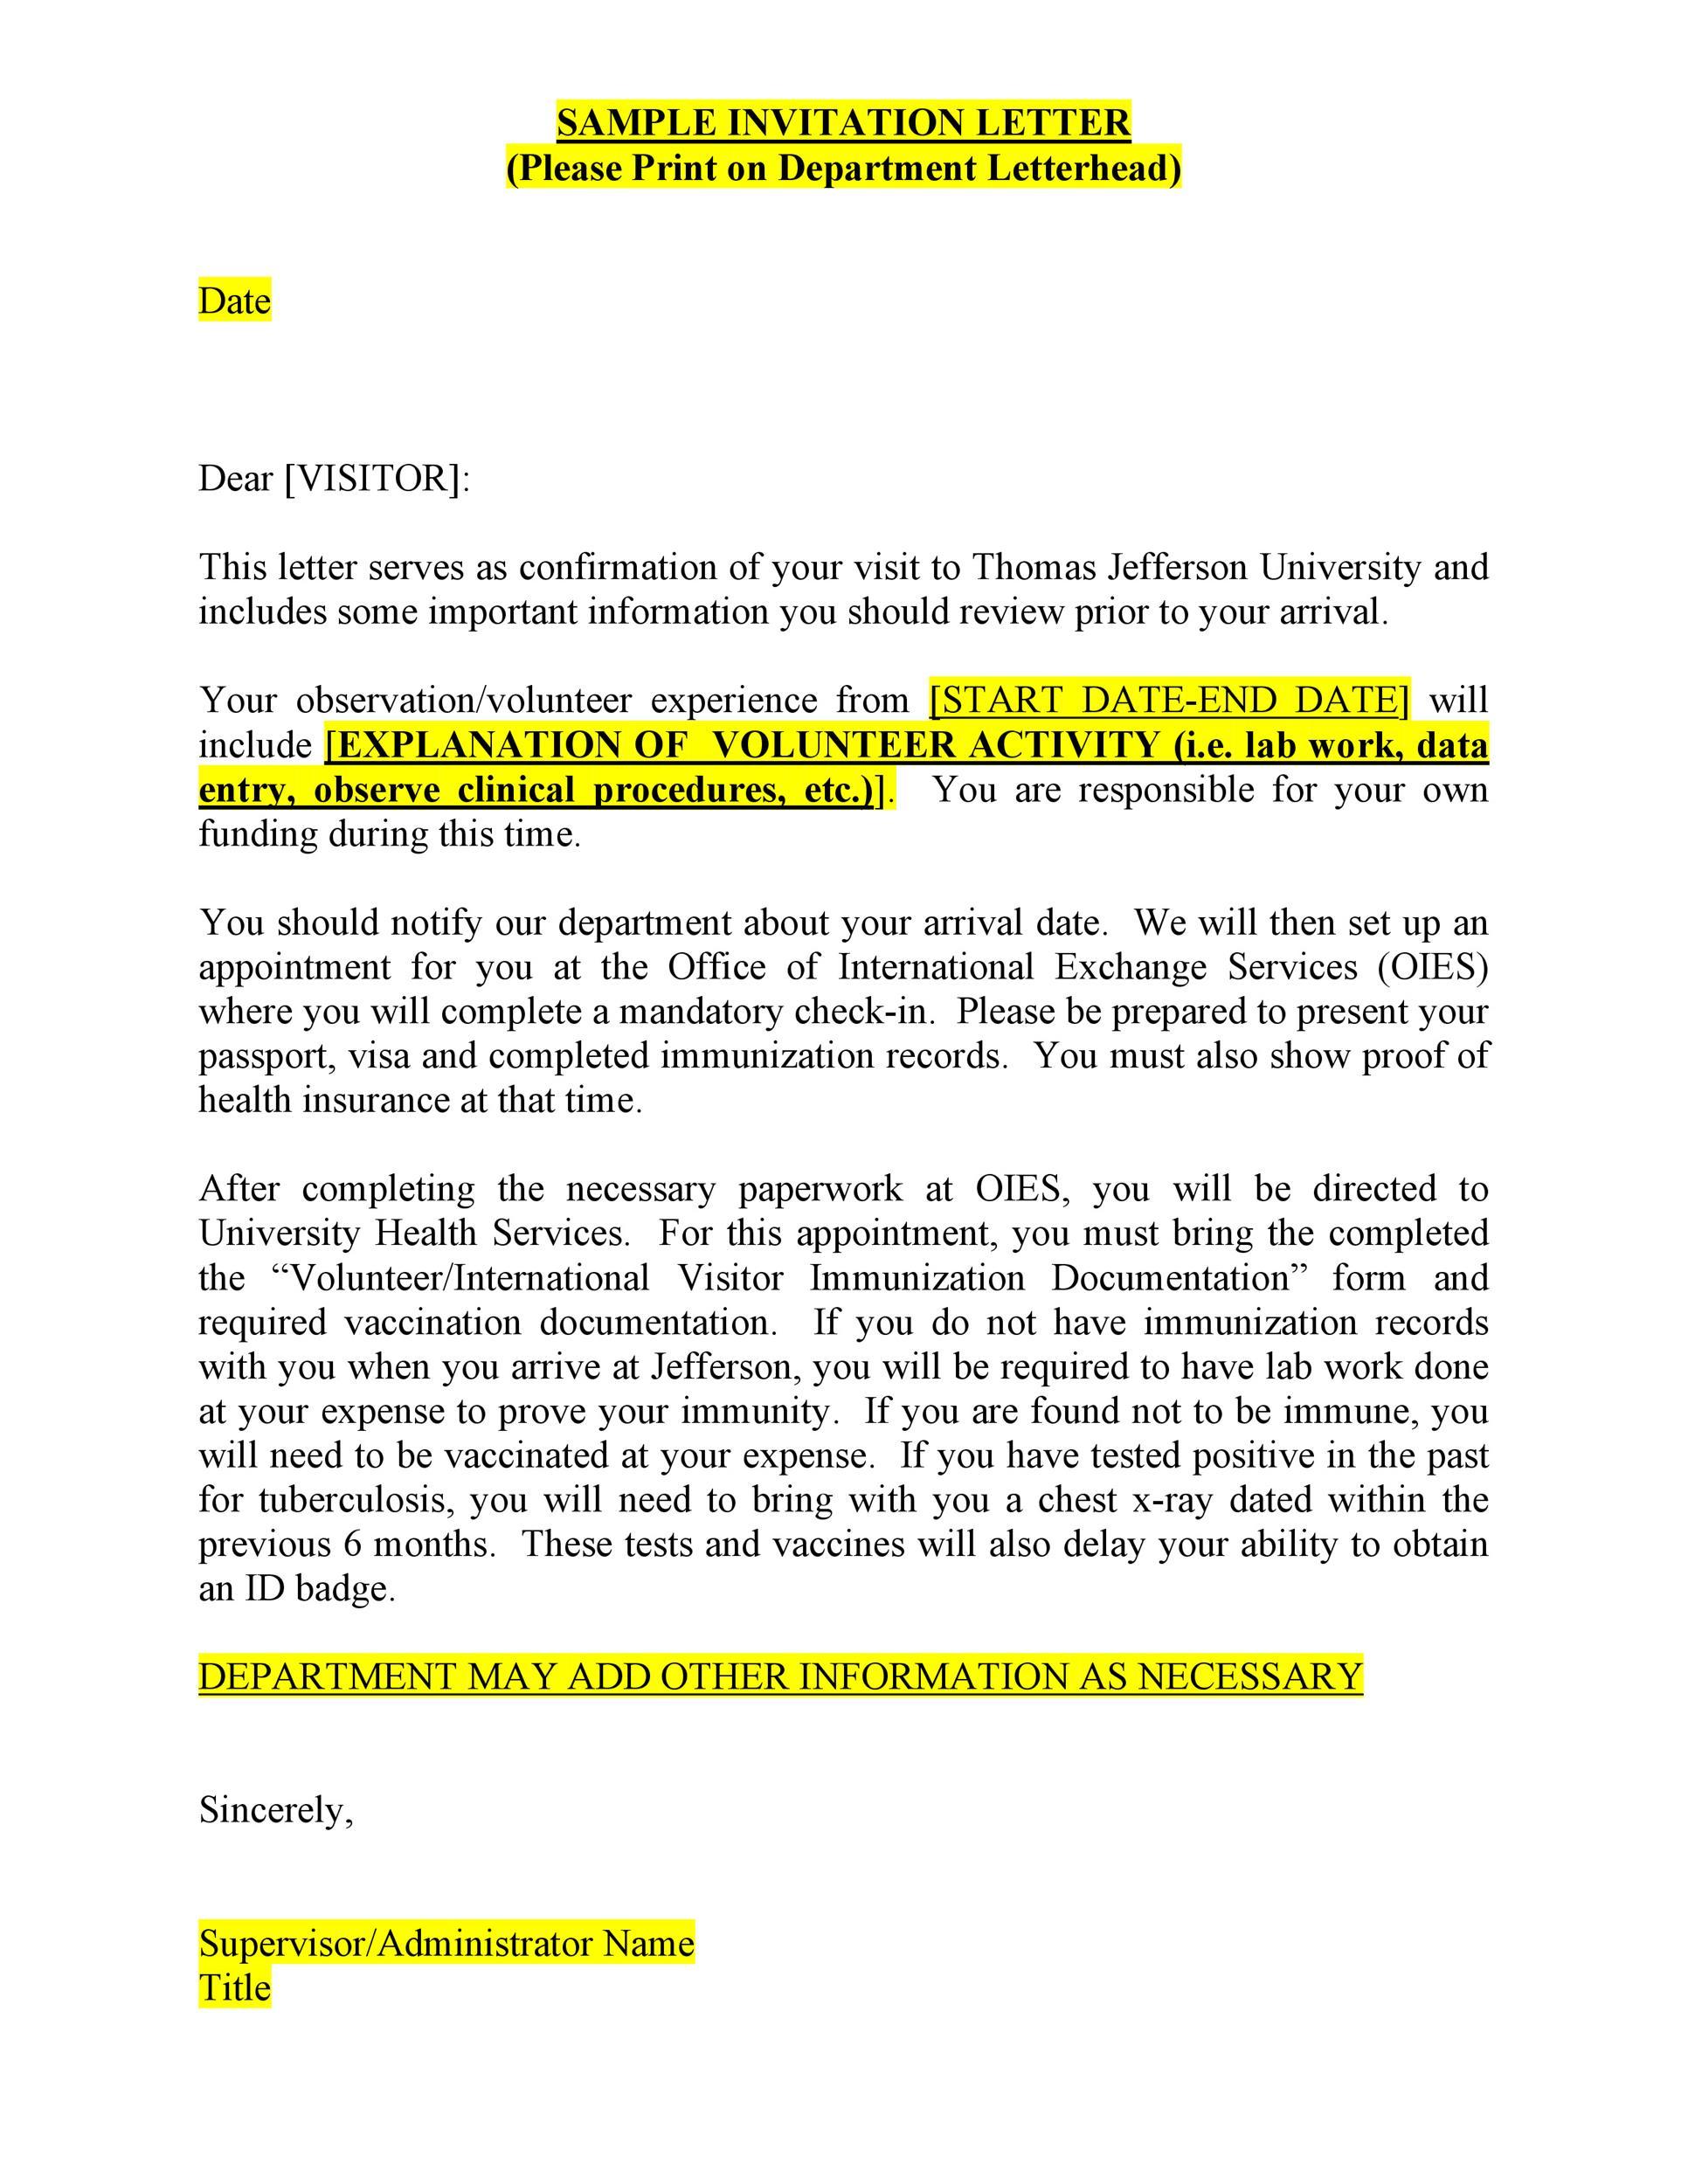 Free invitation letter 11